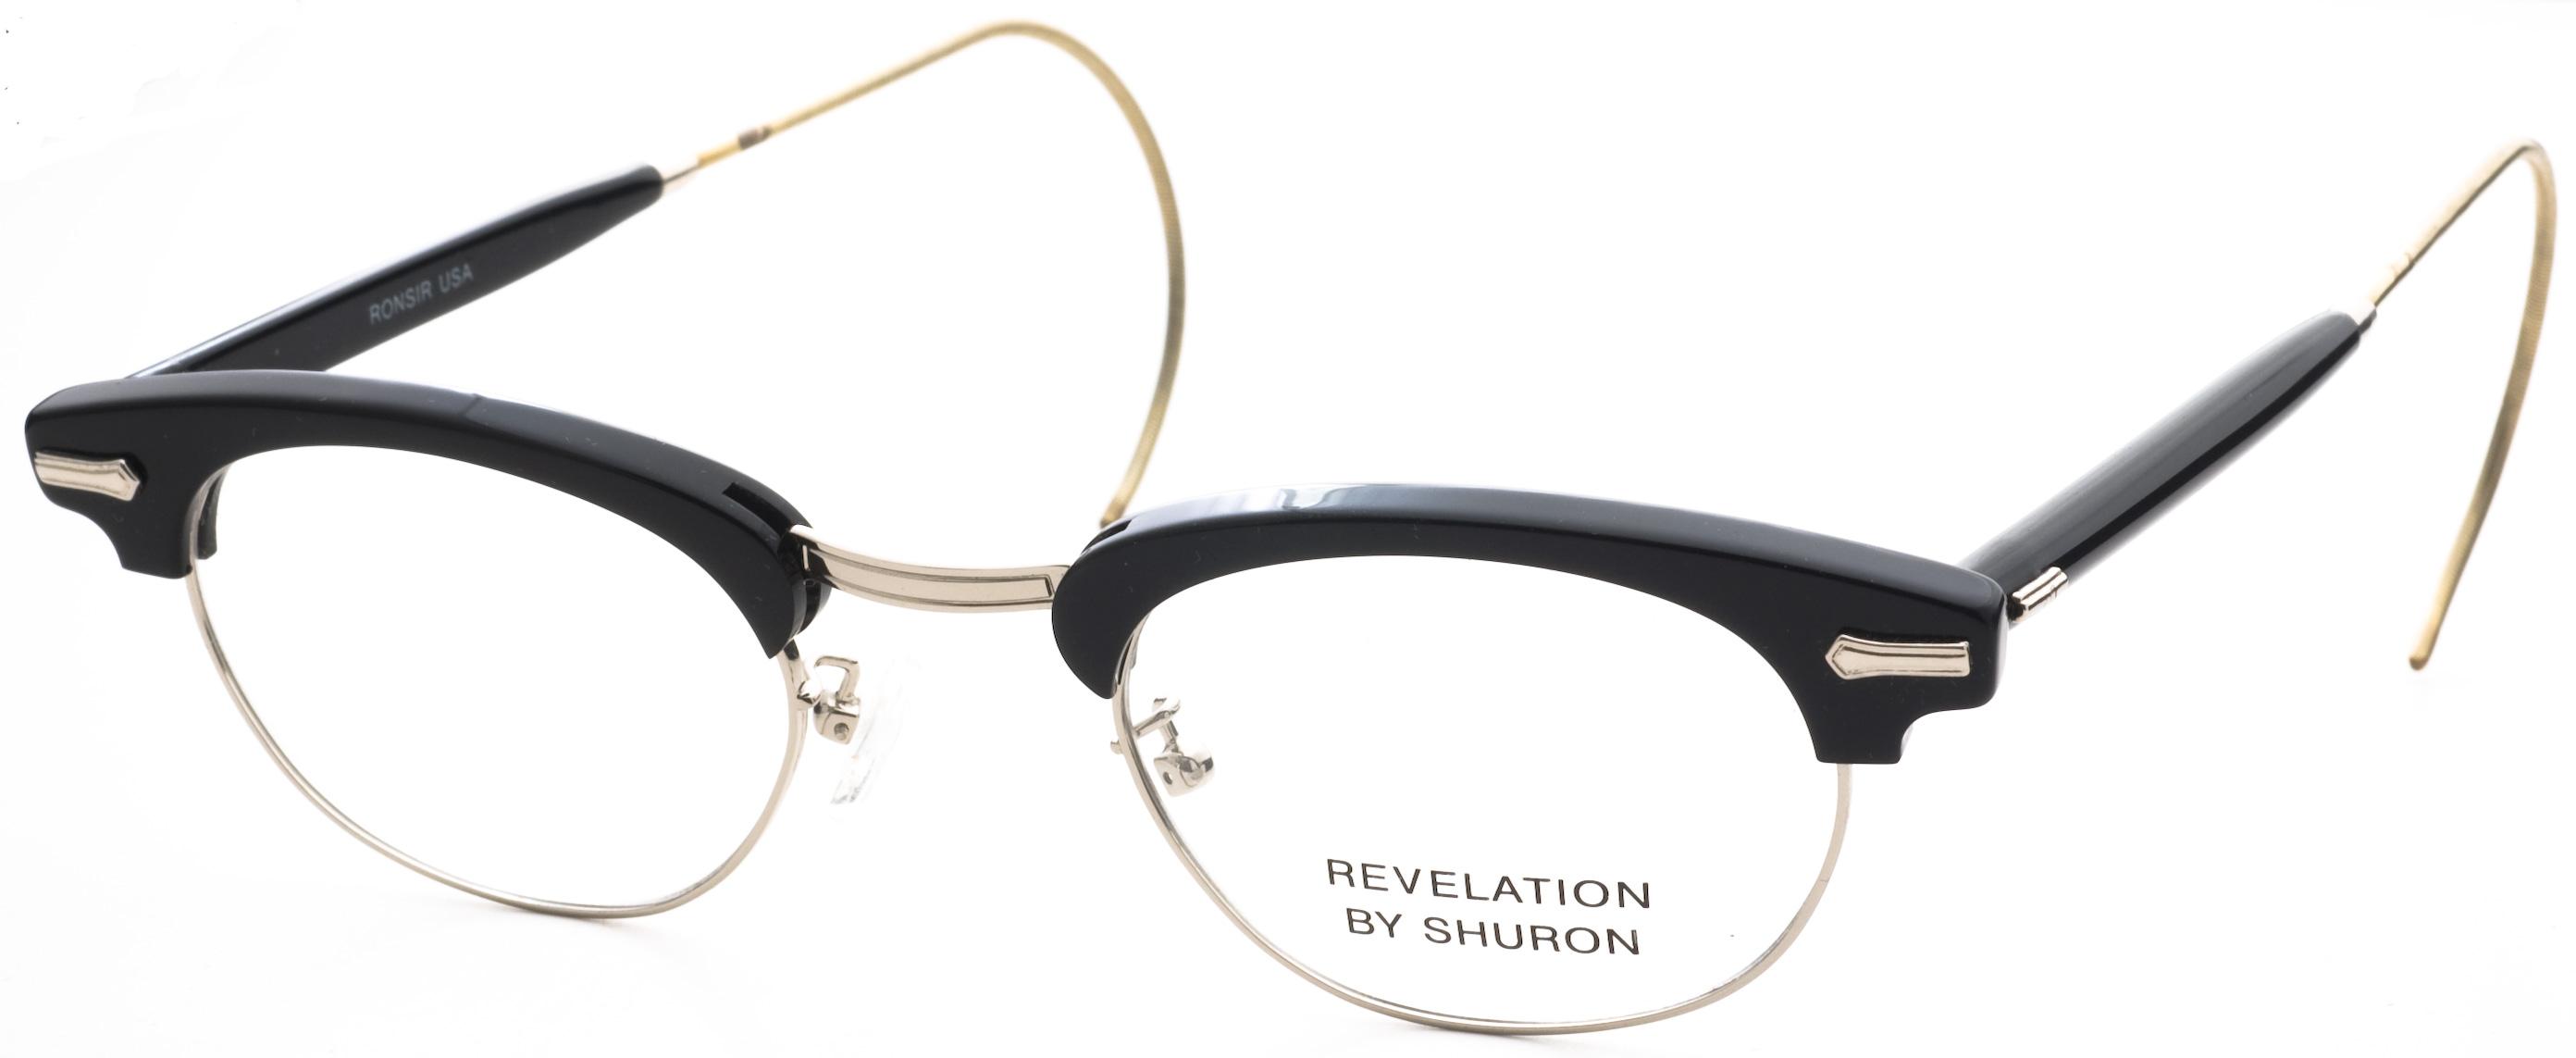 dc377f497a4 eyeglasses  Brand Shuron Lifetime-Eyecare.com has the most ...